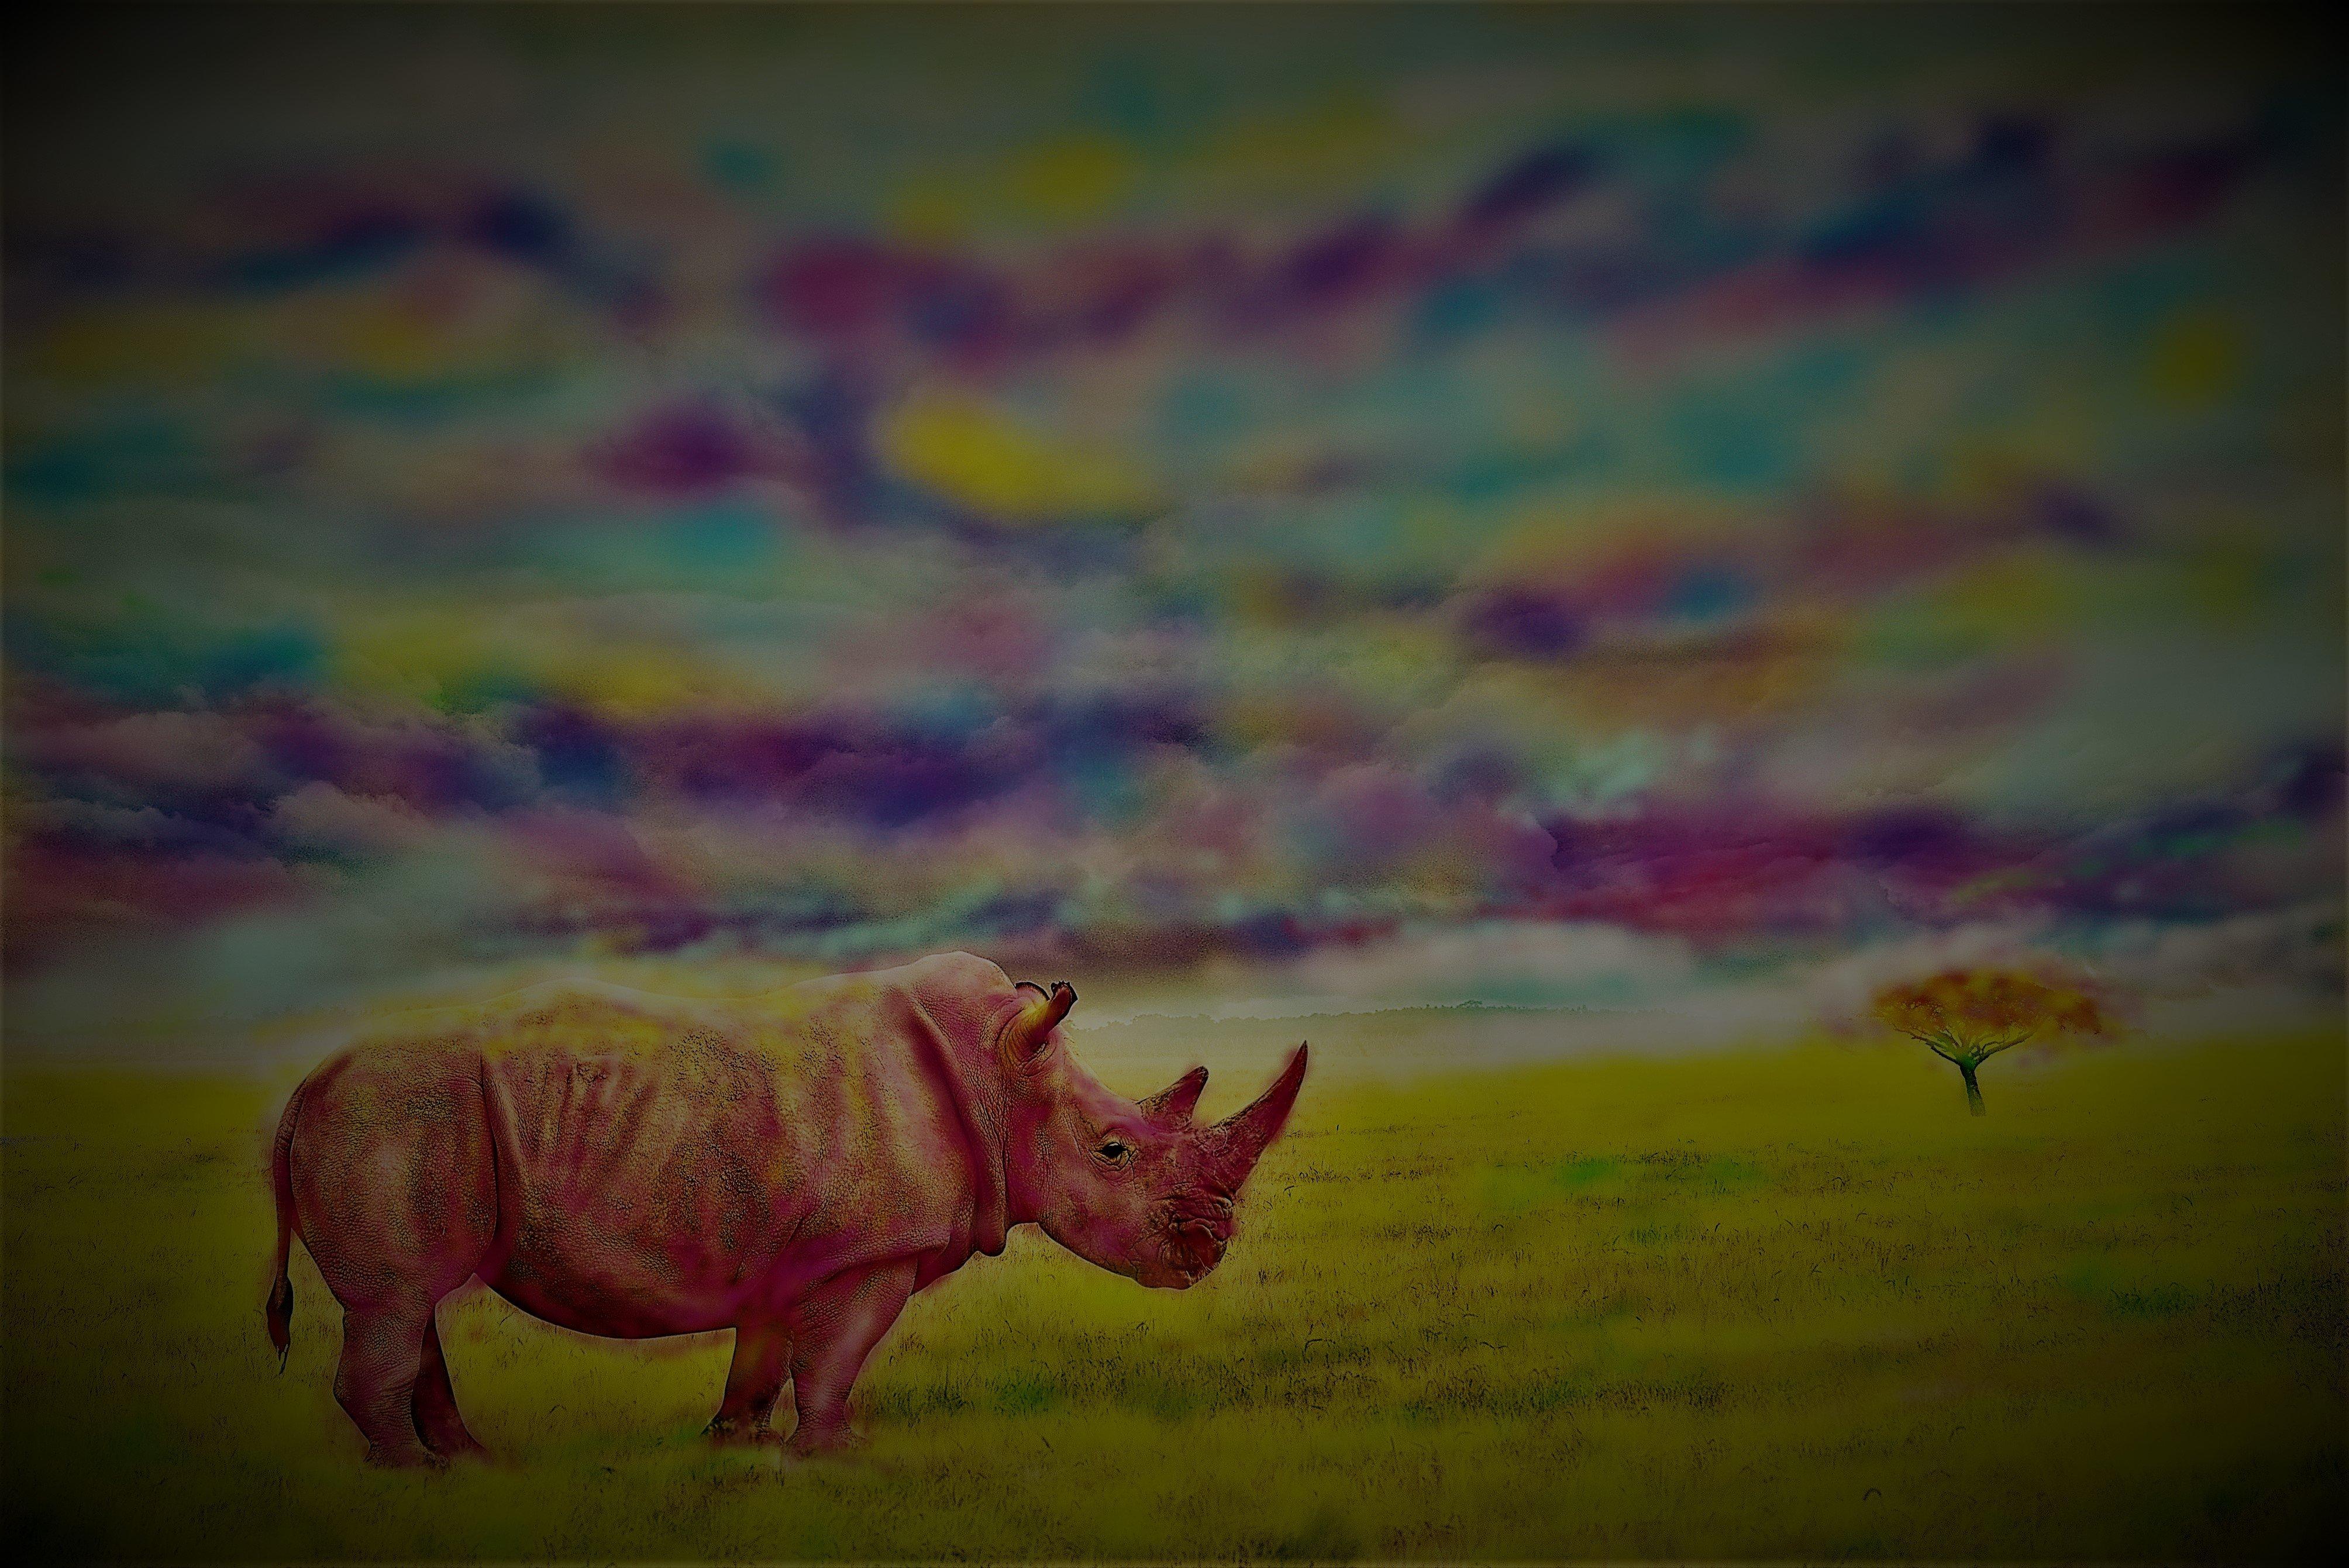 An untitled work by Özge Günaydın consisting of a 35-by-50-centimeter photo manipulation on plexiglass.